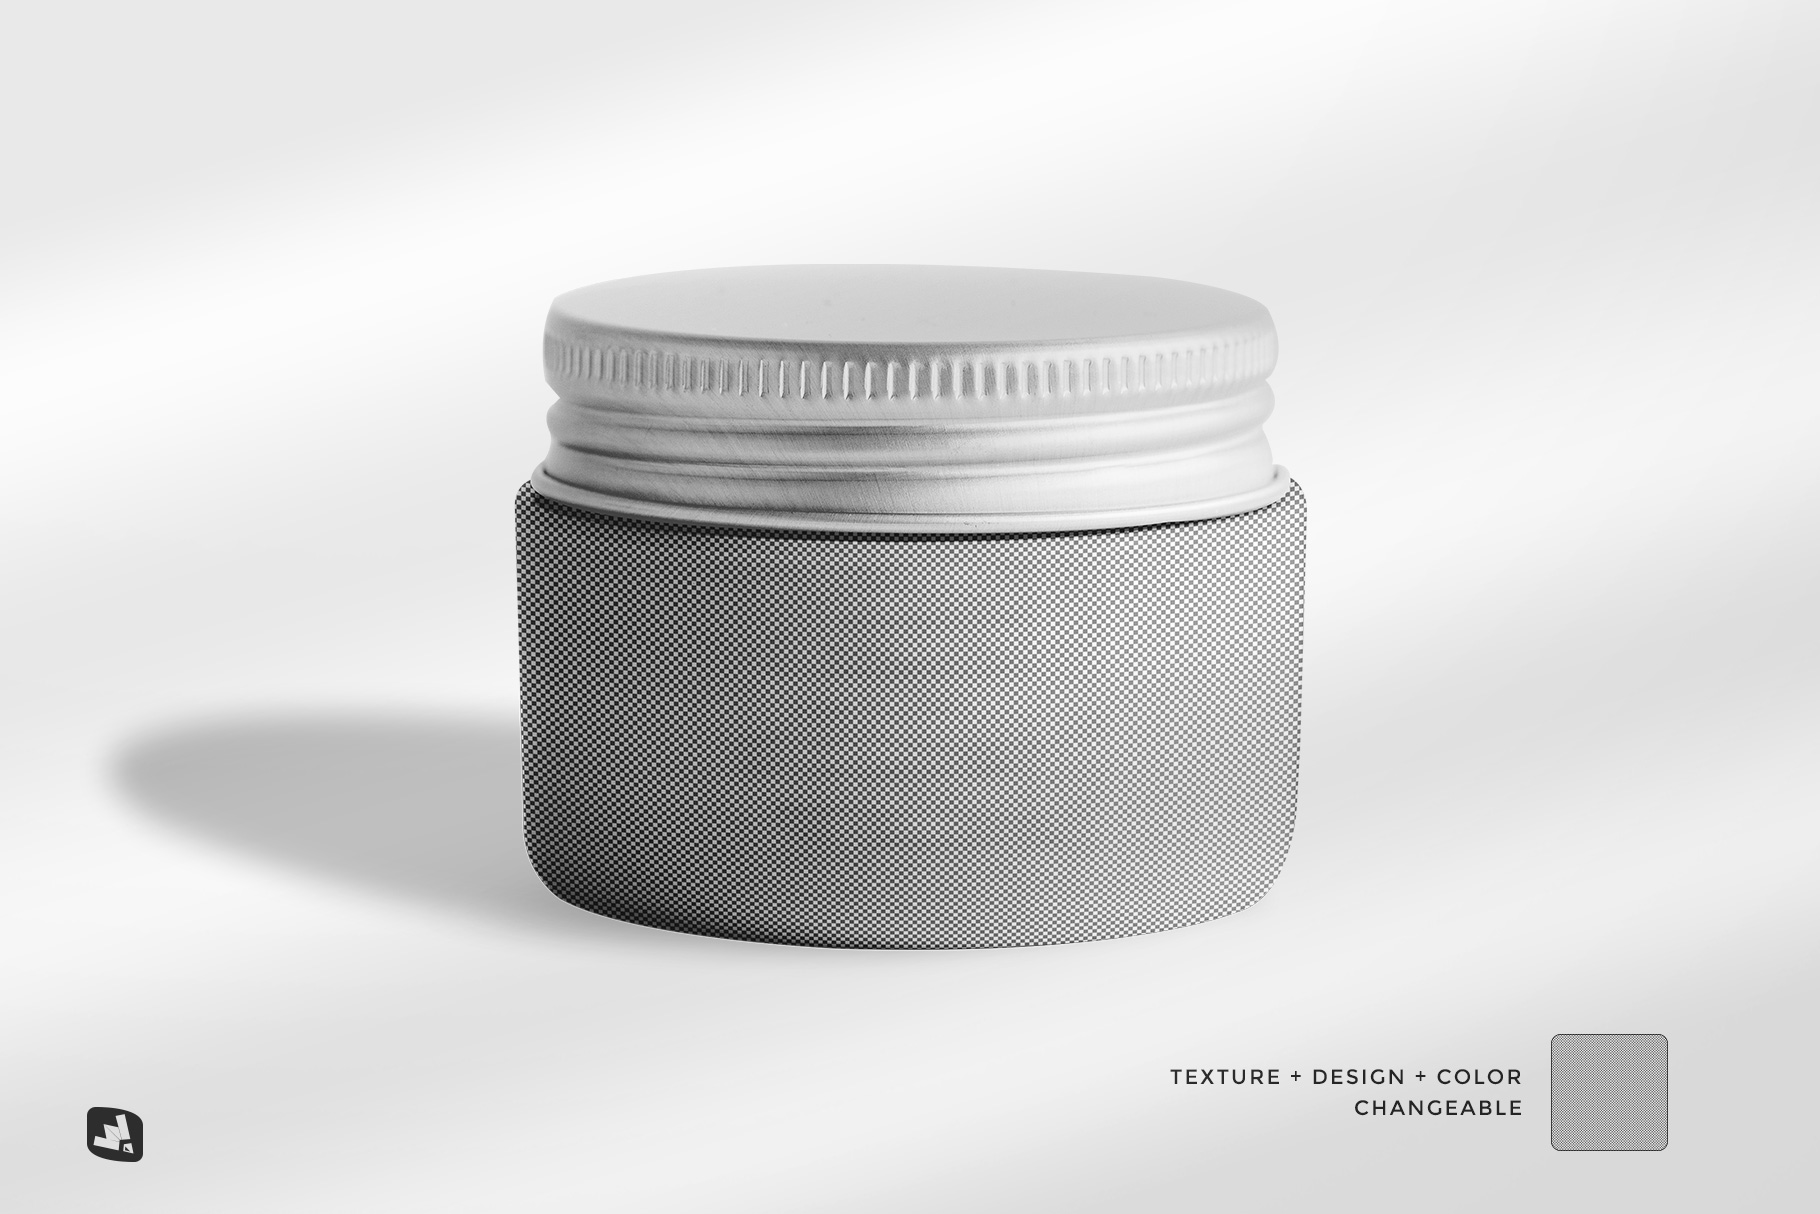 editability of the glass cosmetic jar packaging mockup